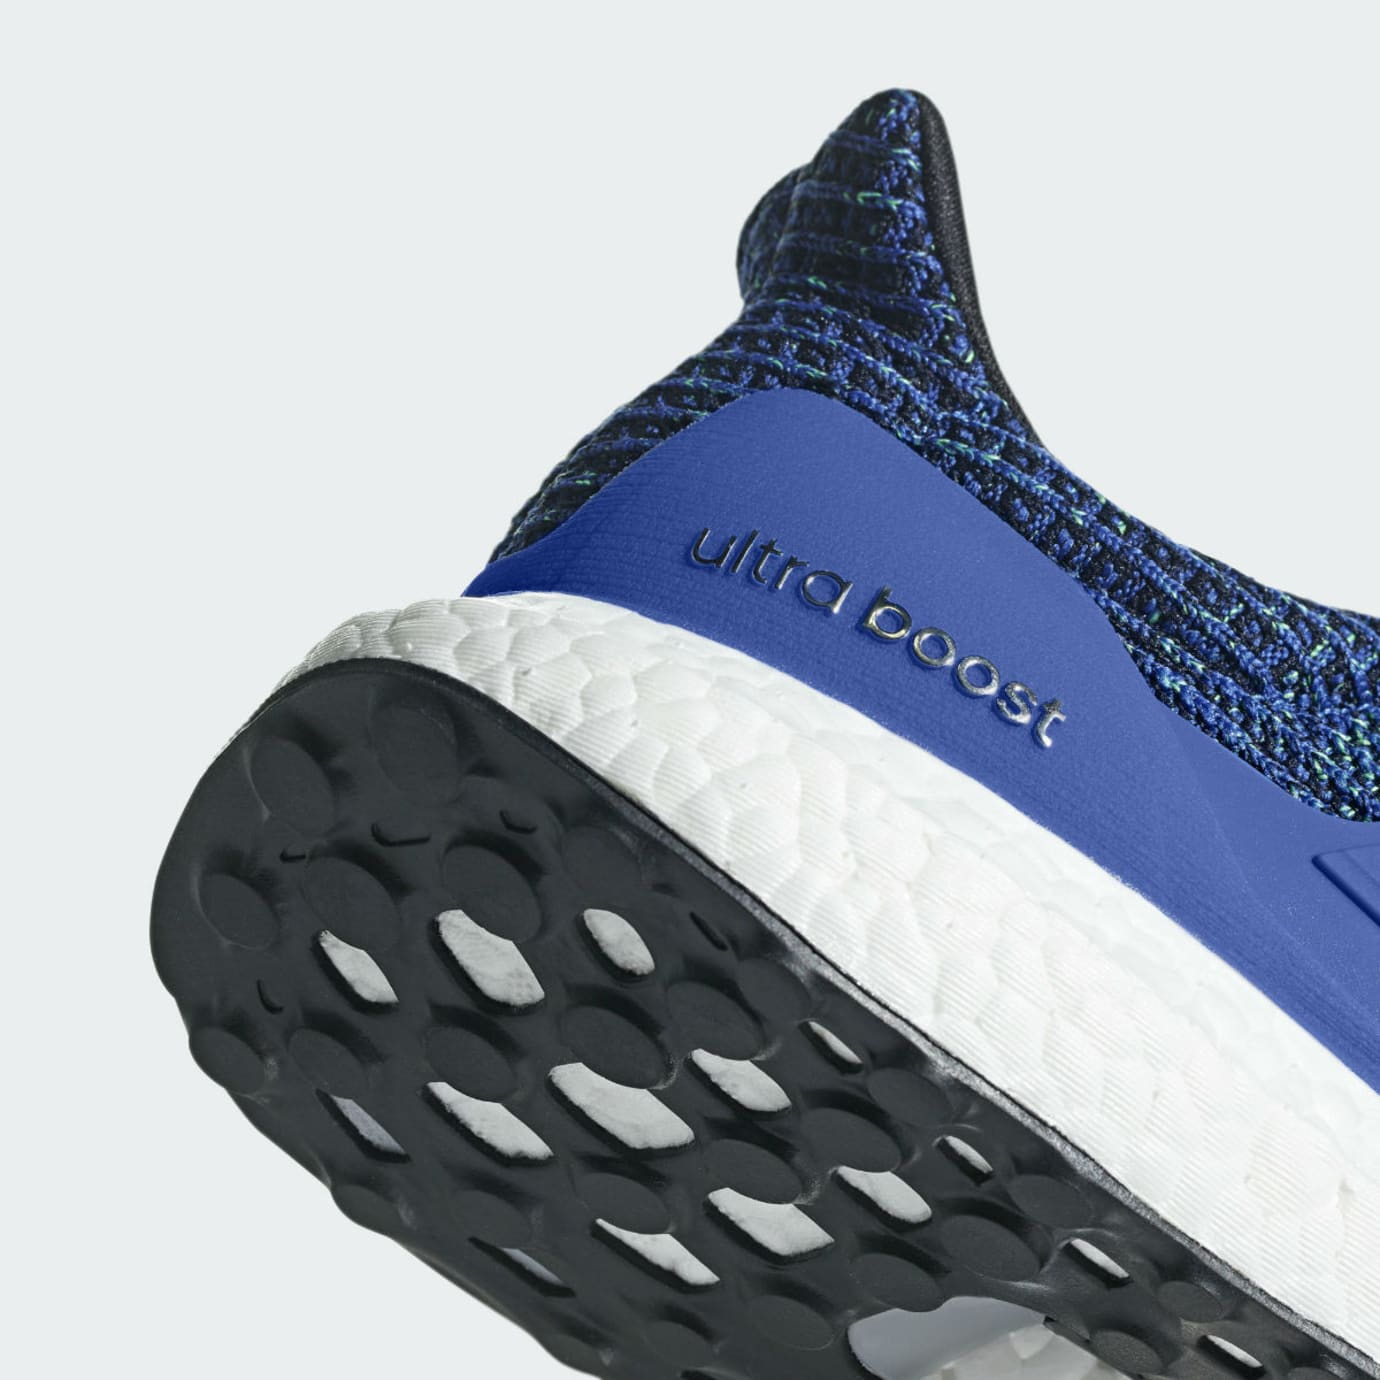 f781c58e2 Image via Adidas Adidas Ultra Boost 4.0 Hi Res Blue Release Date CM8112 Heel